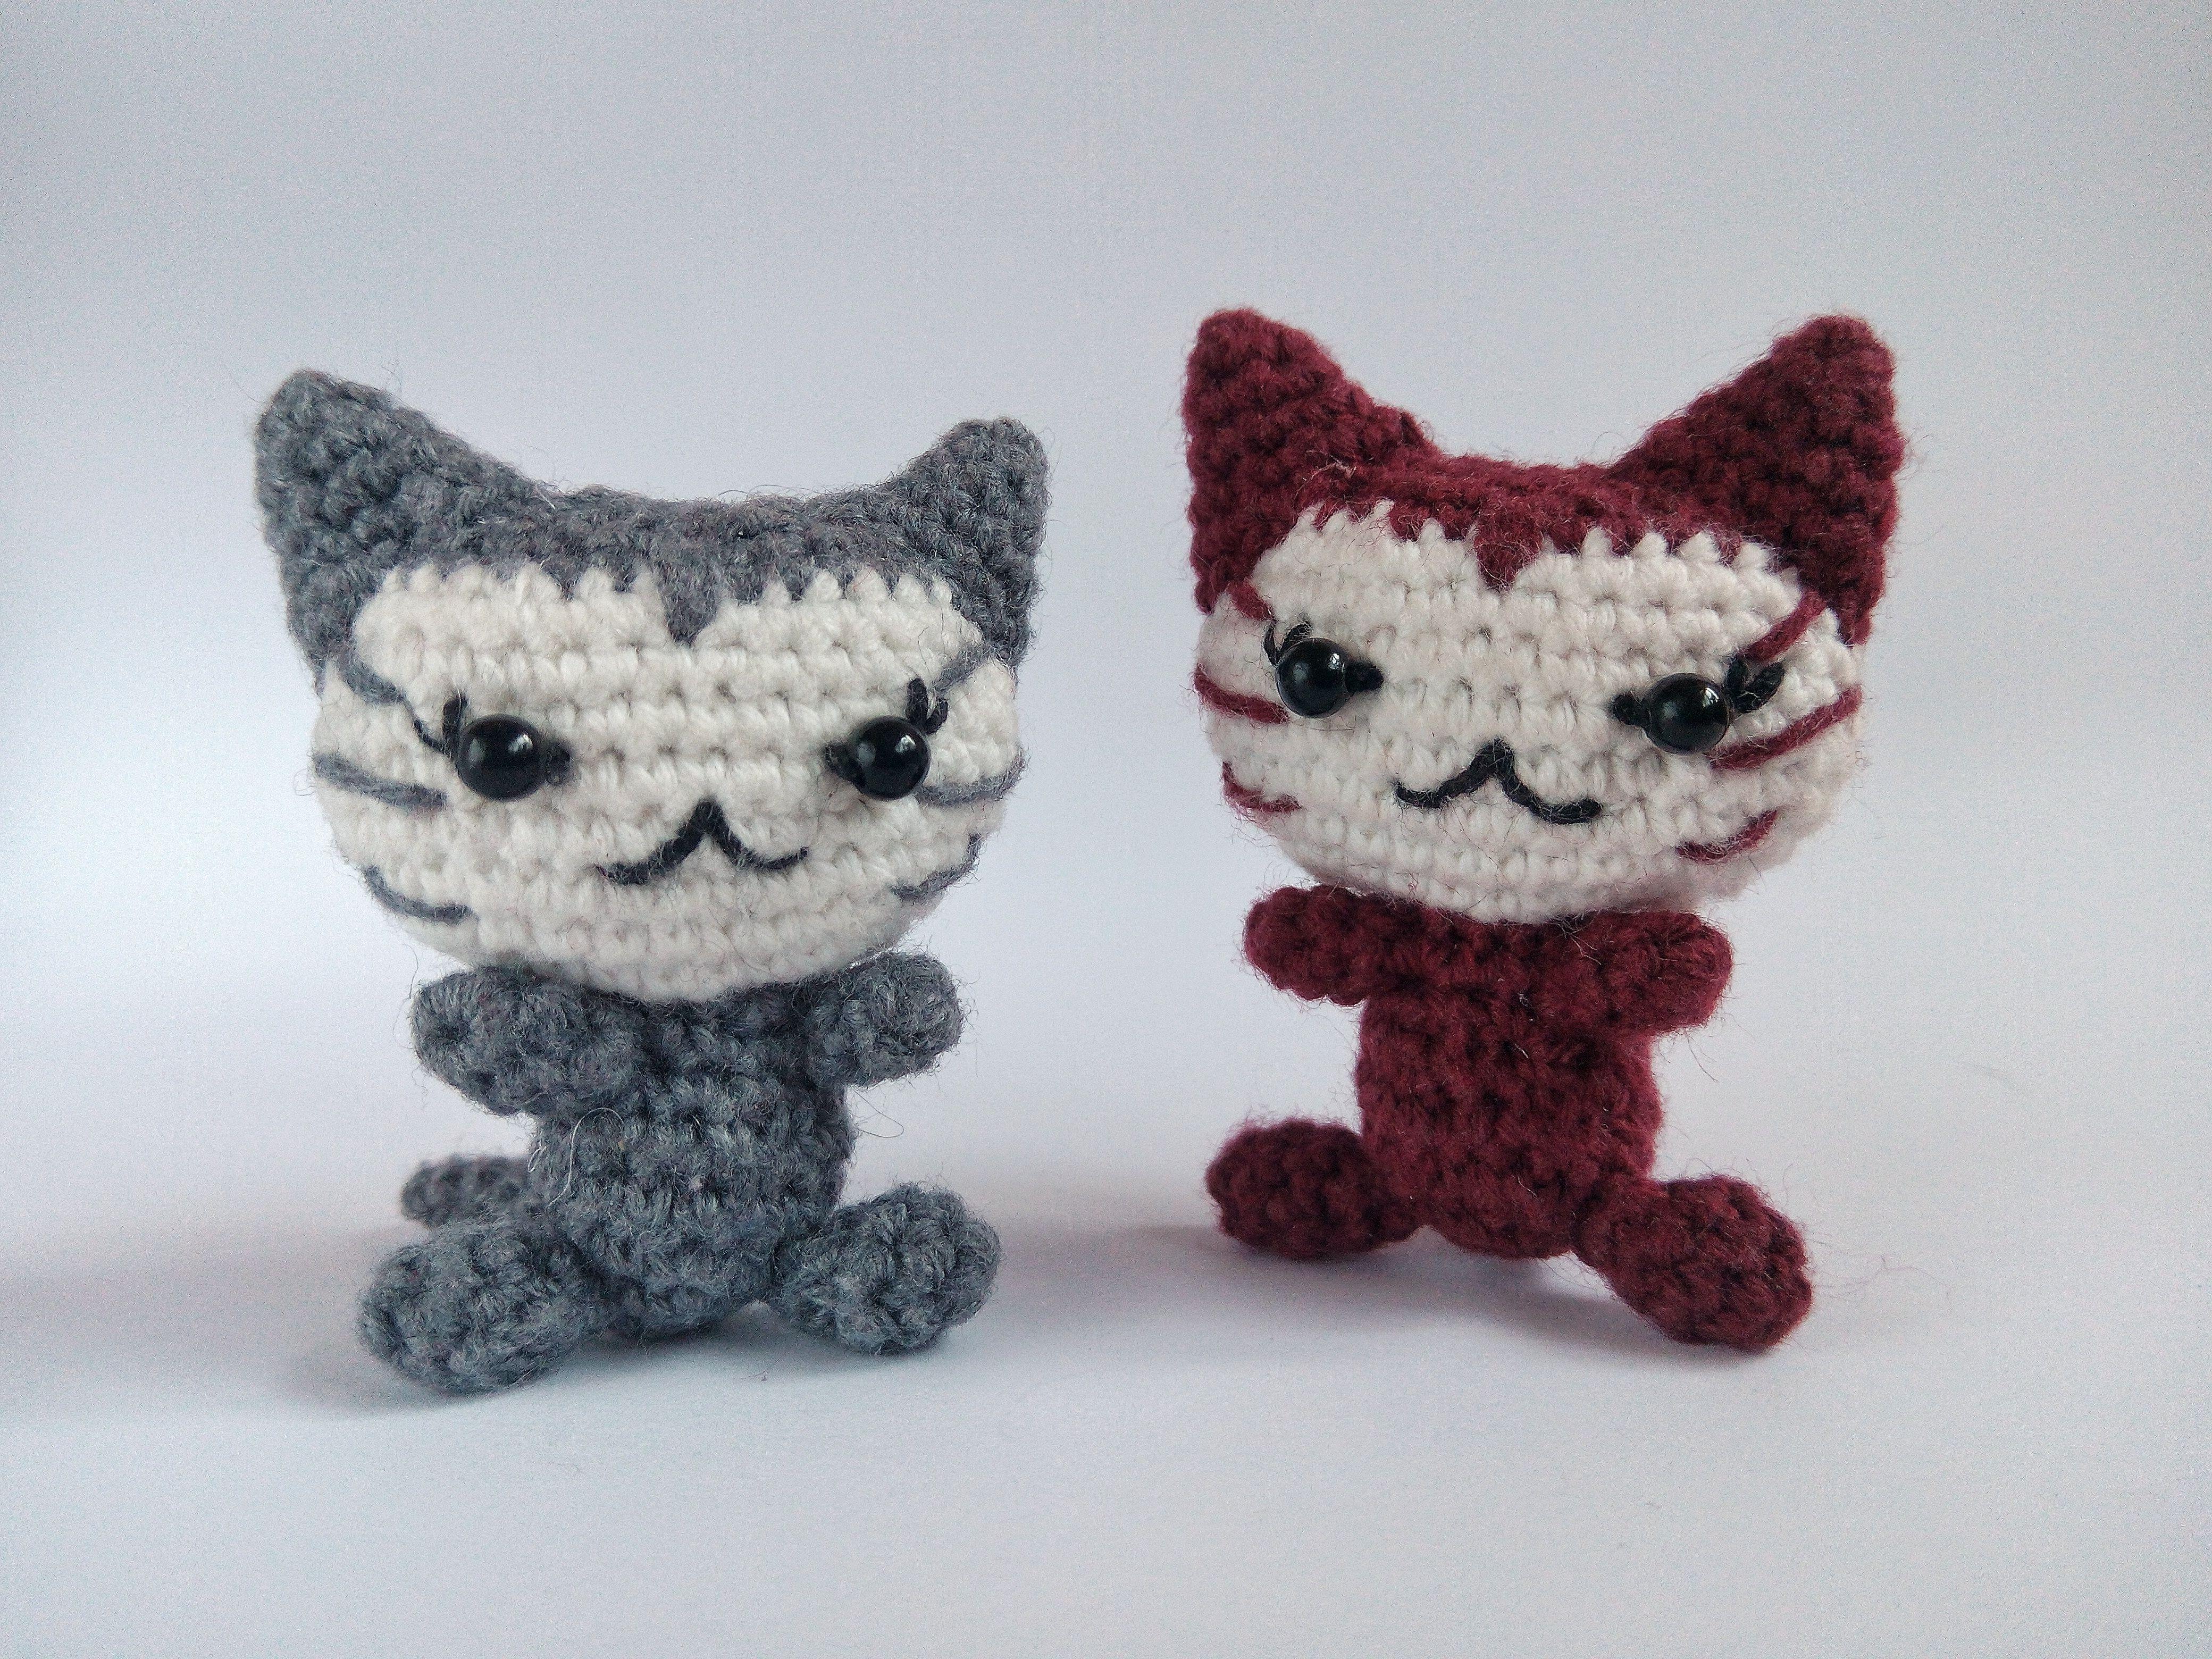 Tiny cat amigurumi pattern | Amiguroom Toys | 3120x4160